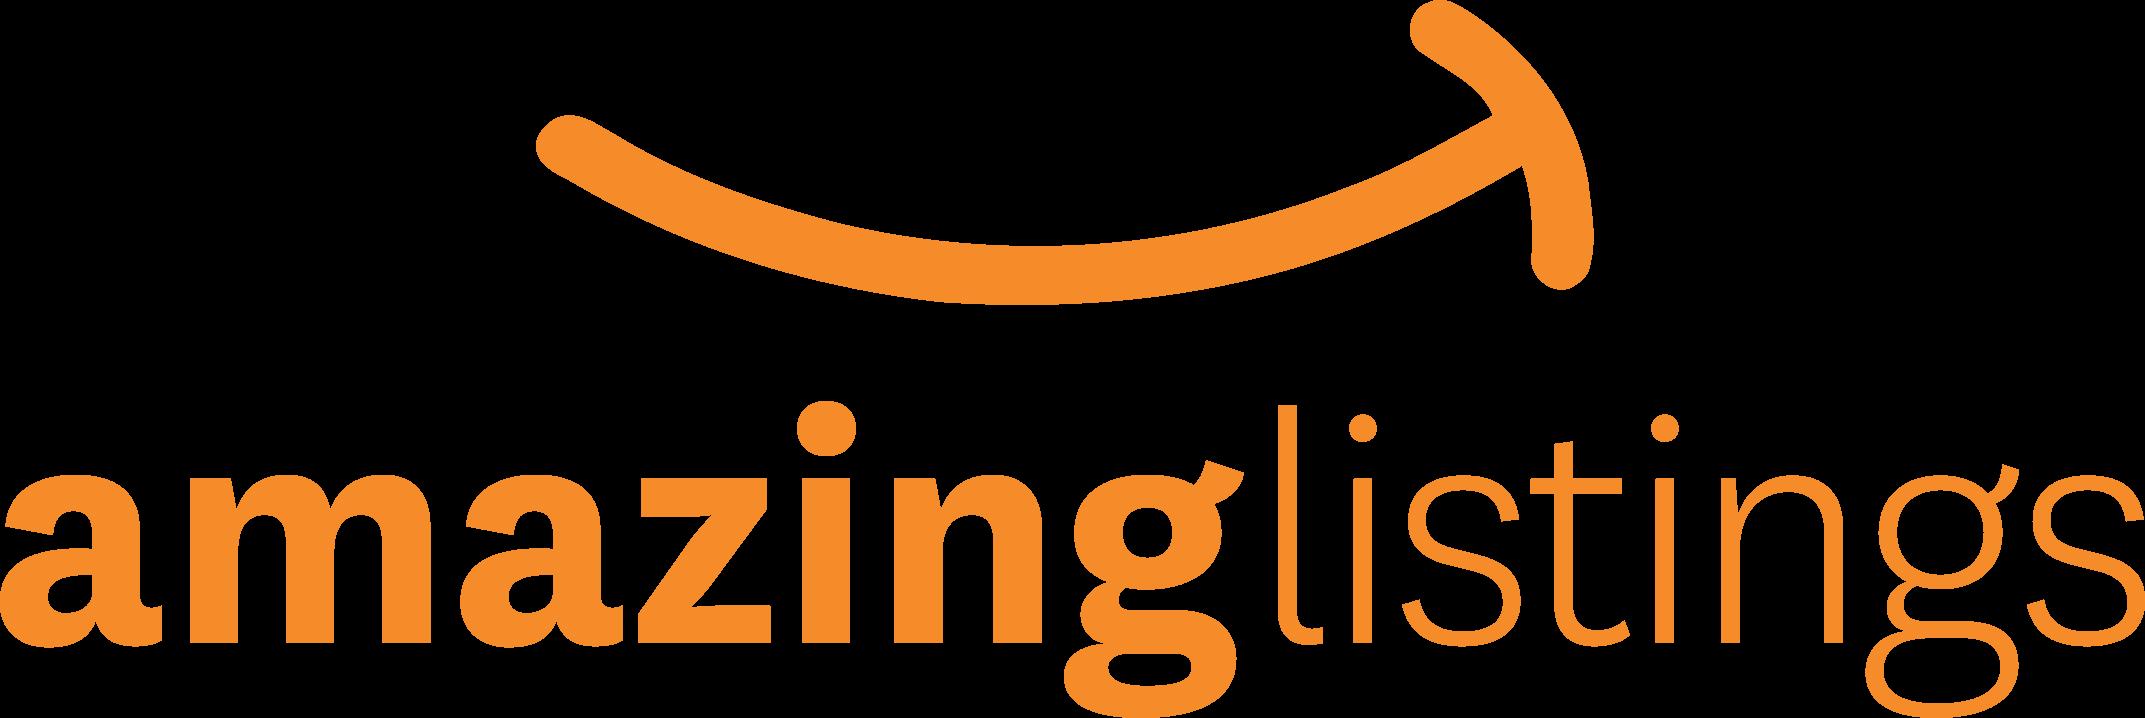 Amazing Listings